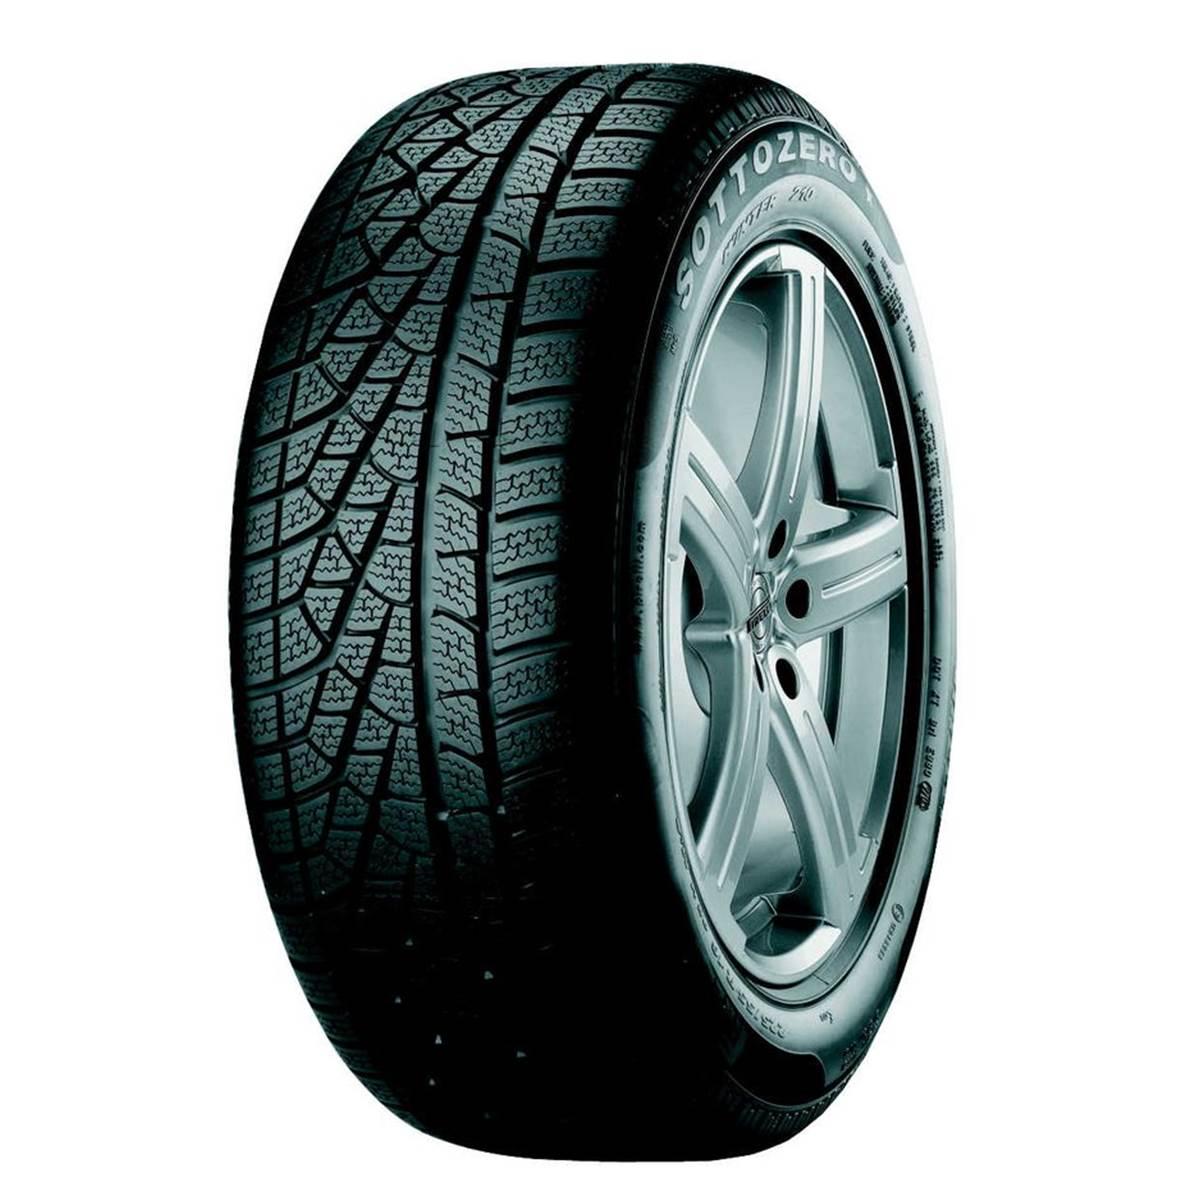 Pneu Runflat Hiver Pirelli 225/50R17 94H Winter Sottozero 3